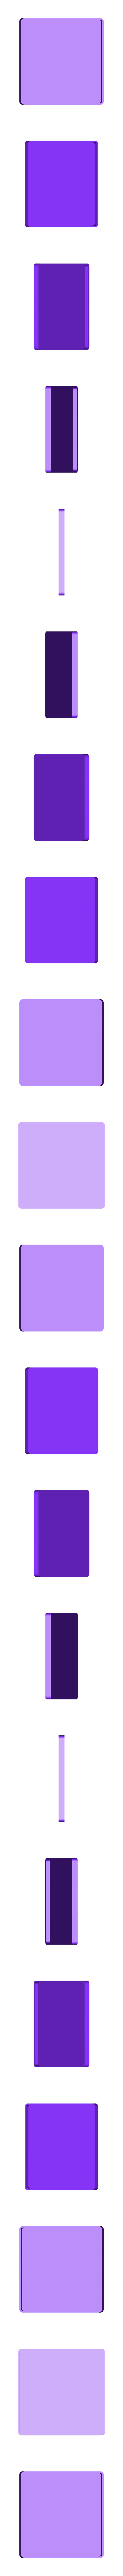 box.stl Download STL file 15 Puzzle Game • Template to 3D print, Vuglu